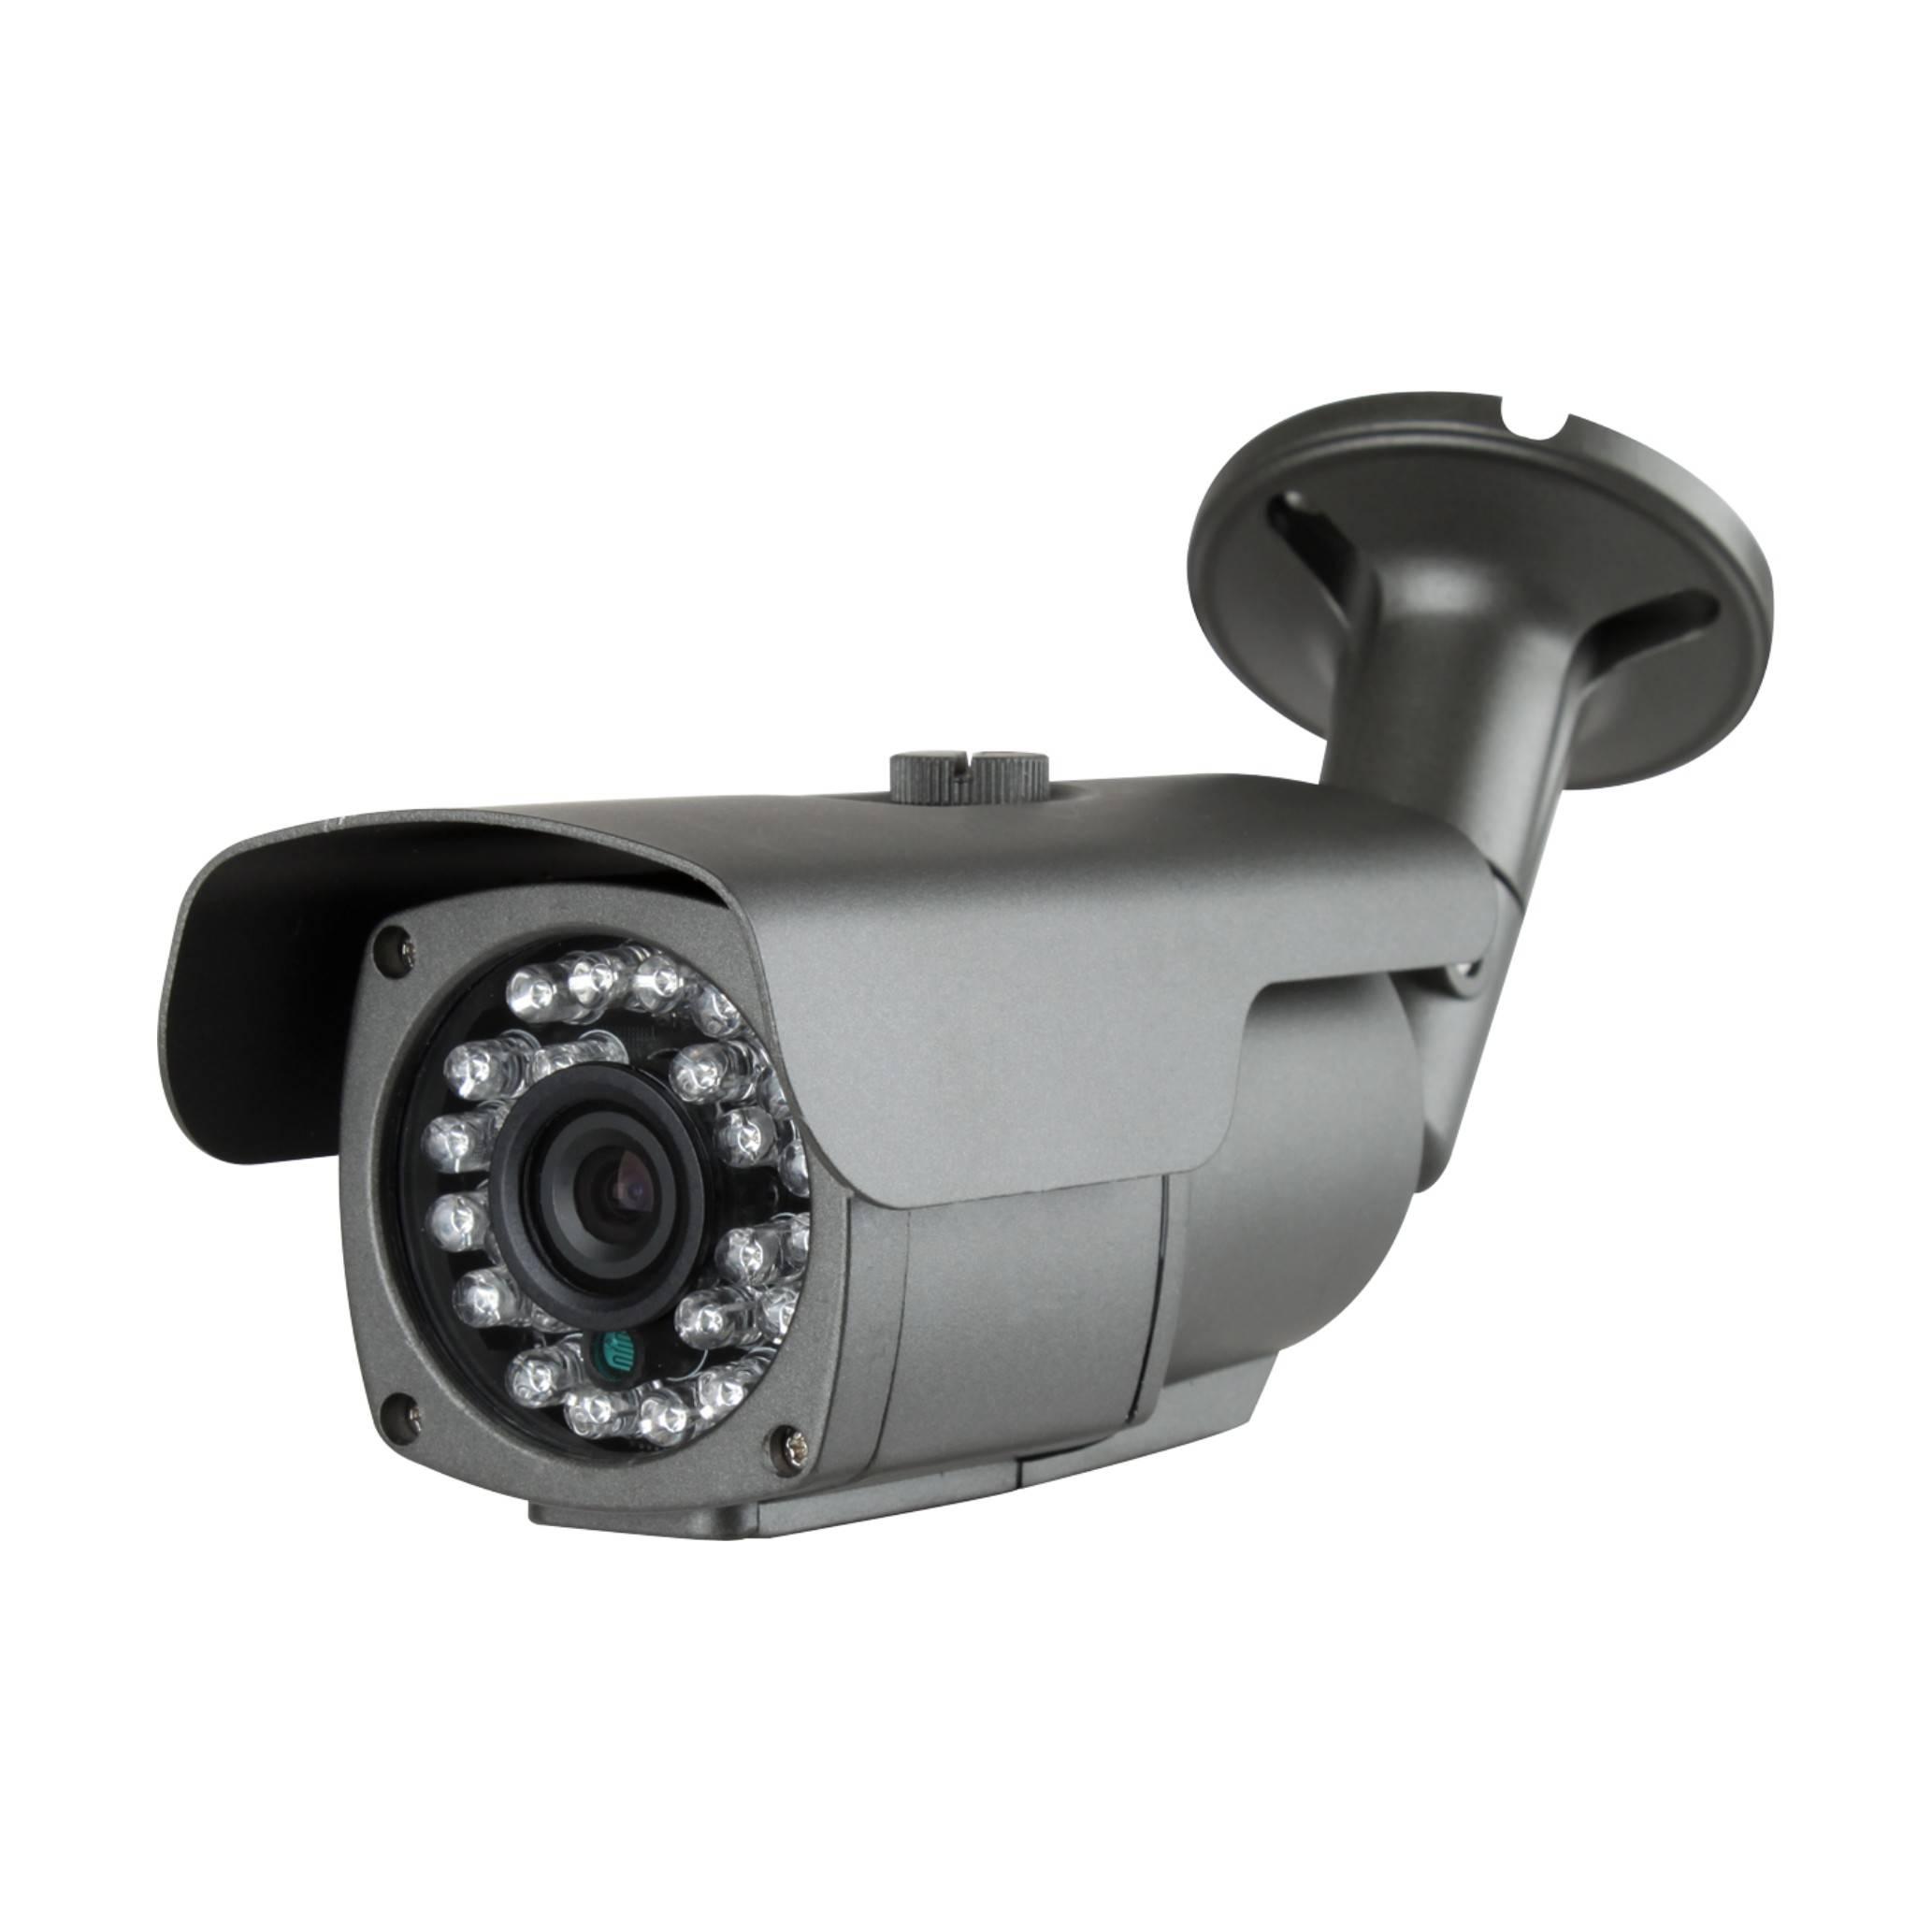 Outdoor 1/3 SONY CCD Bullet Camera